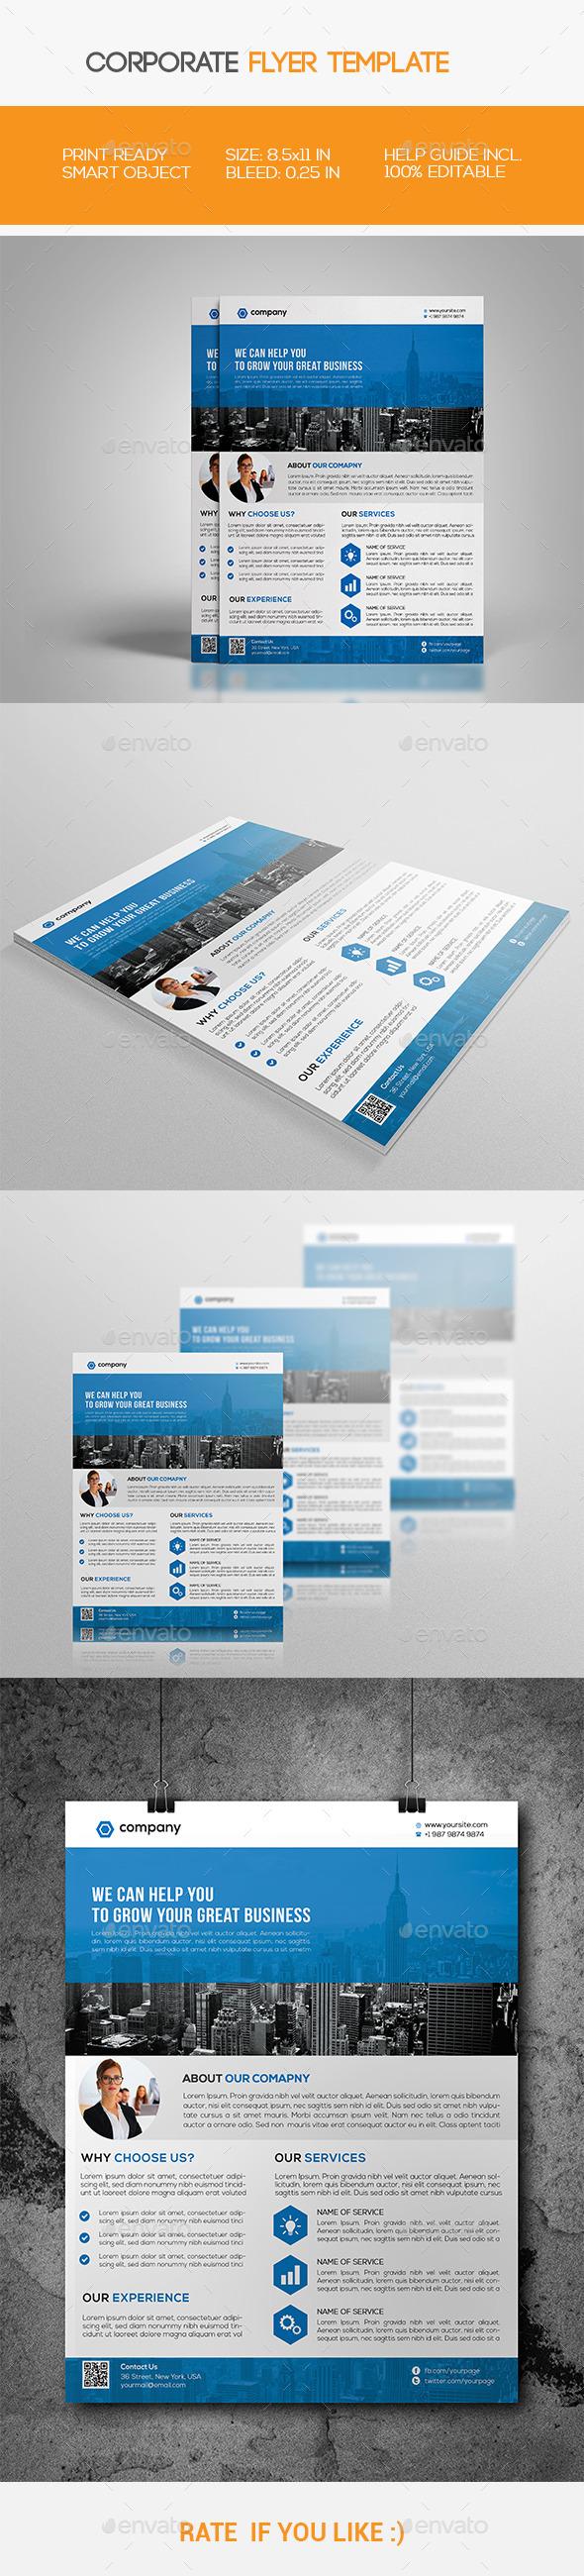 GraphicRiver Corporate Flyer 11562295